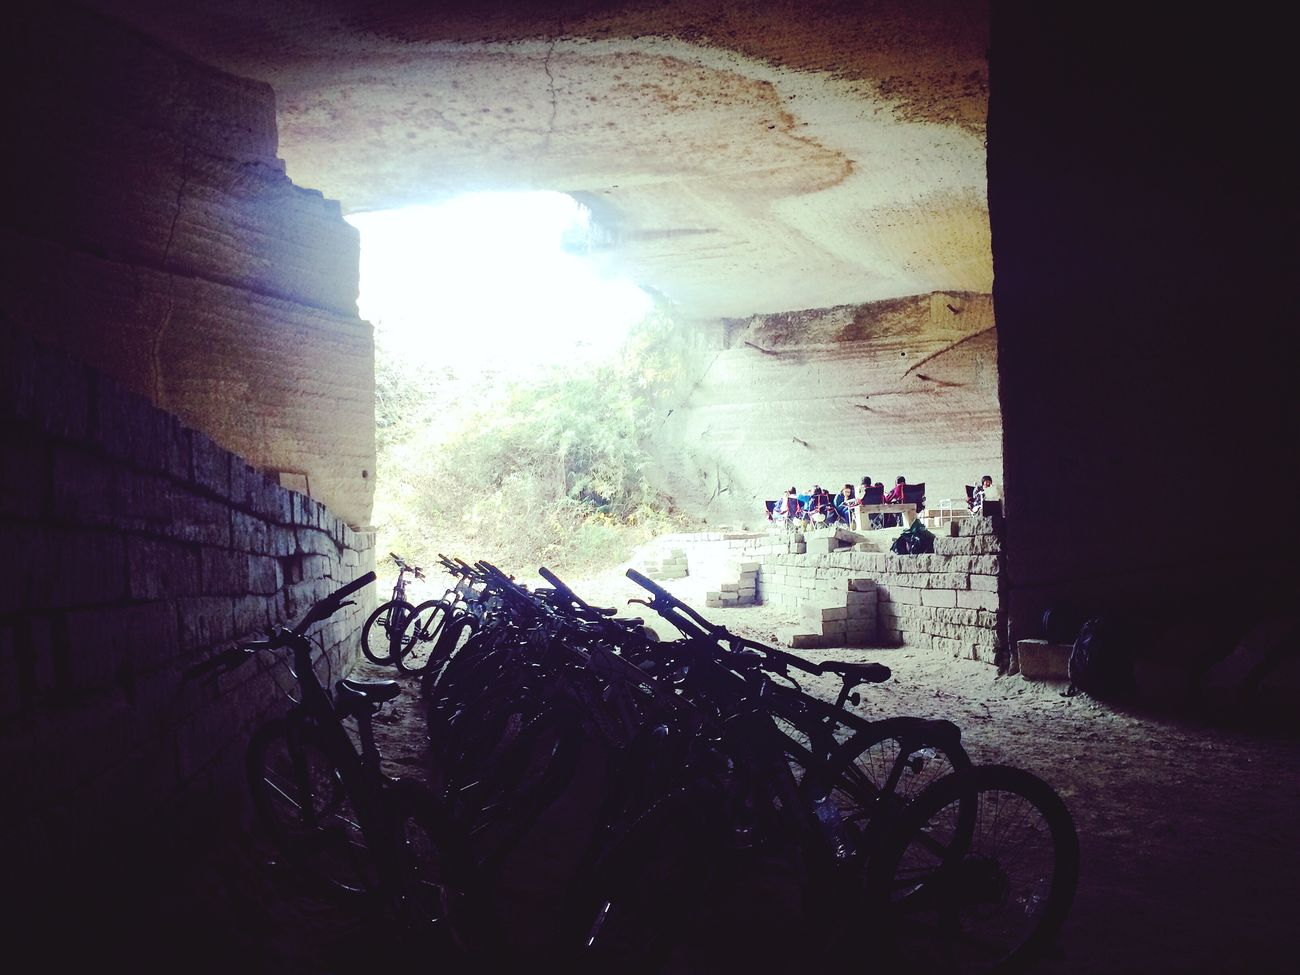 Underground 宇都宮 Utsunomiya 大谷石 大谷採石場 地底 Japan Ohyaunderground Cycle Lunchtime チイキカチ